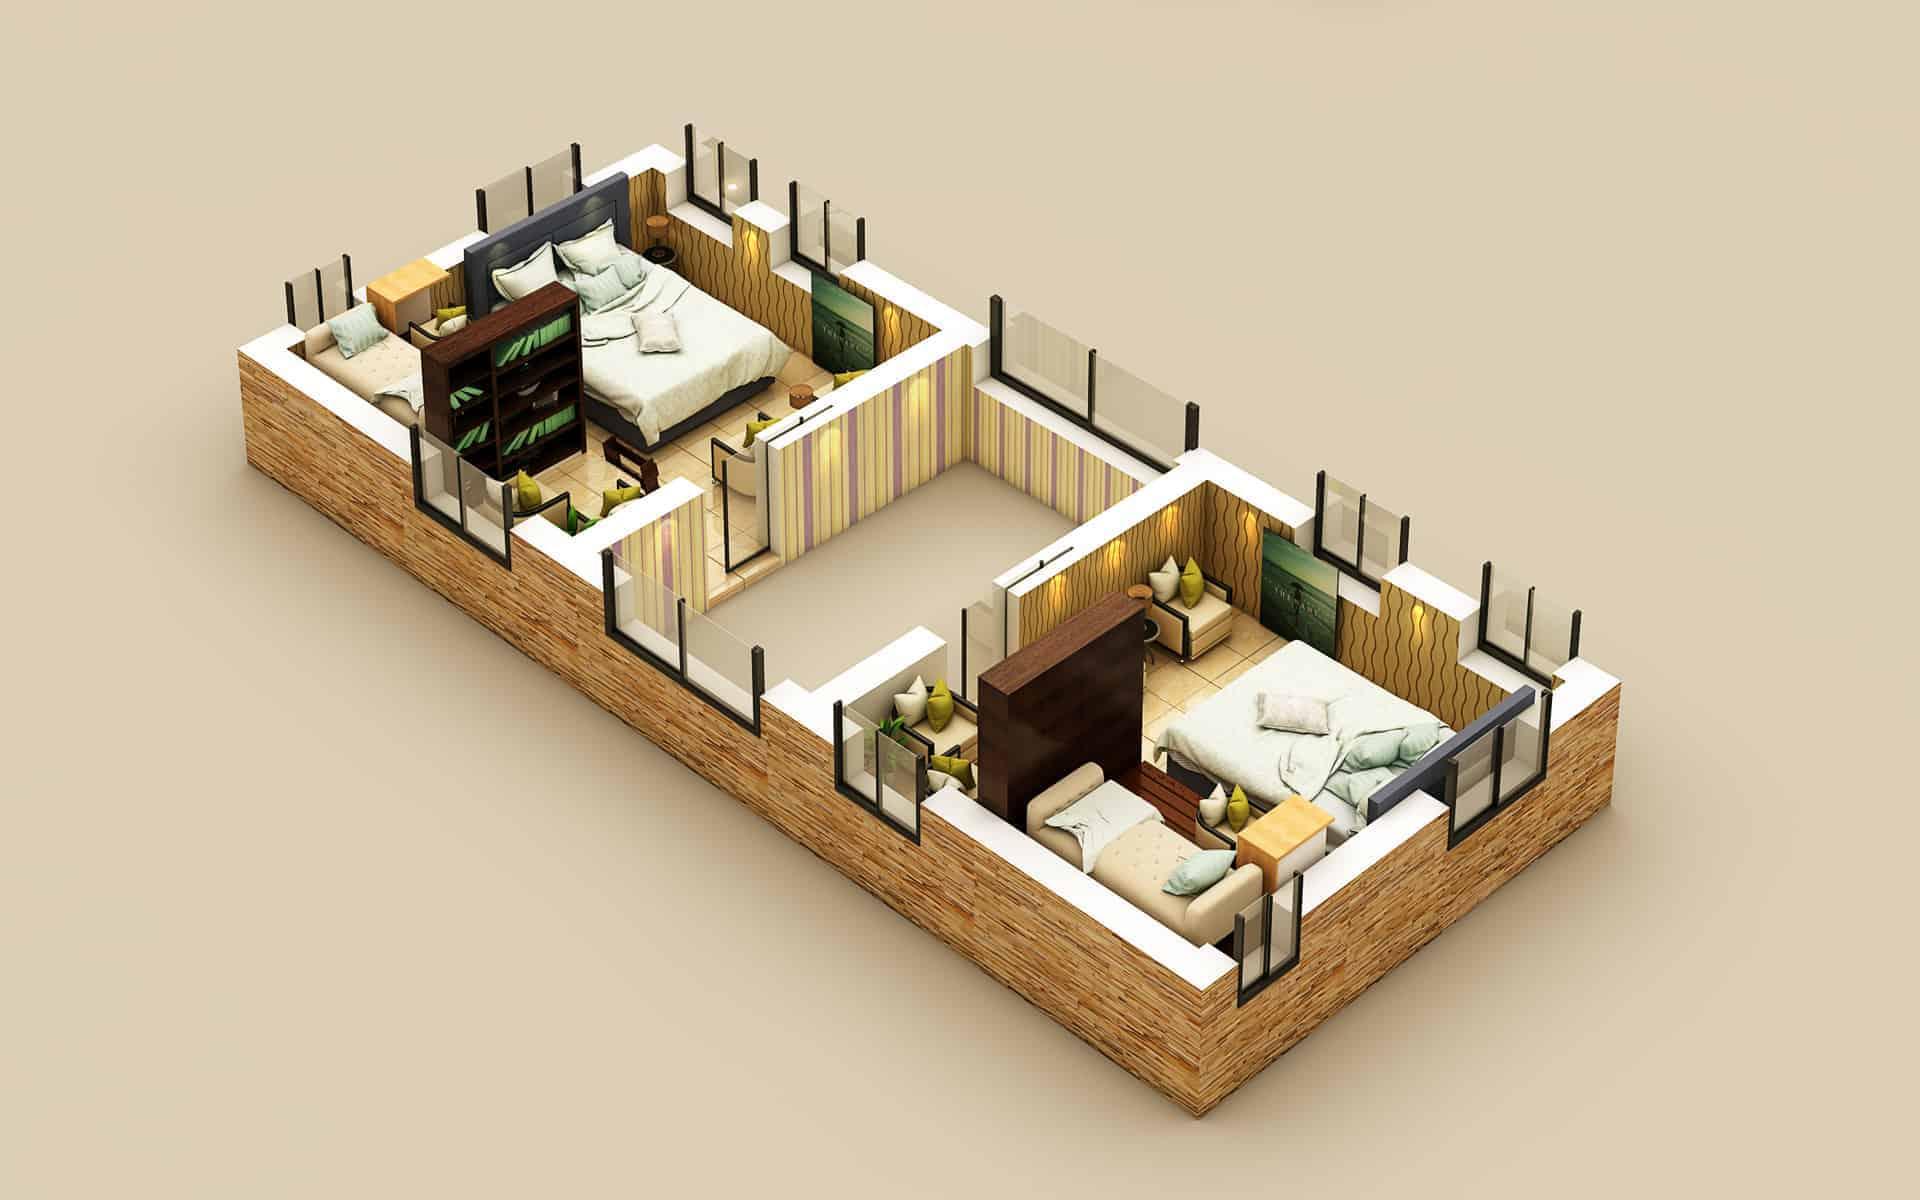 Porta Cabin Residential Design Ideas